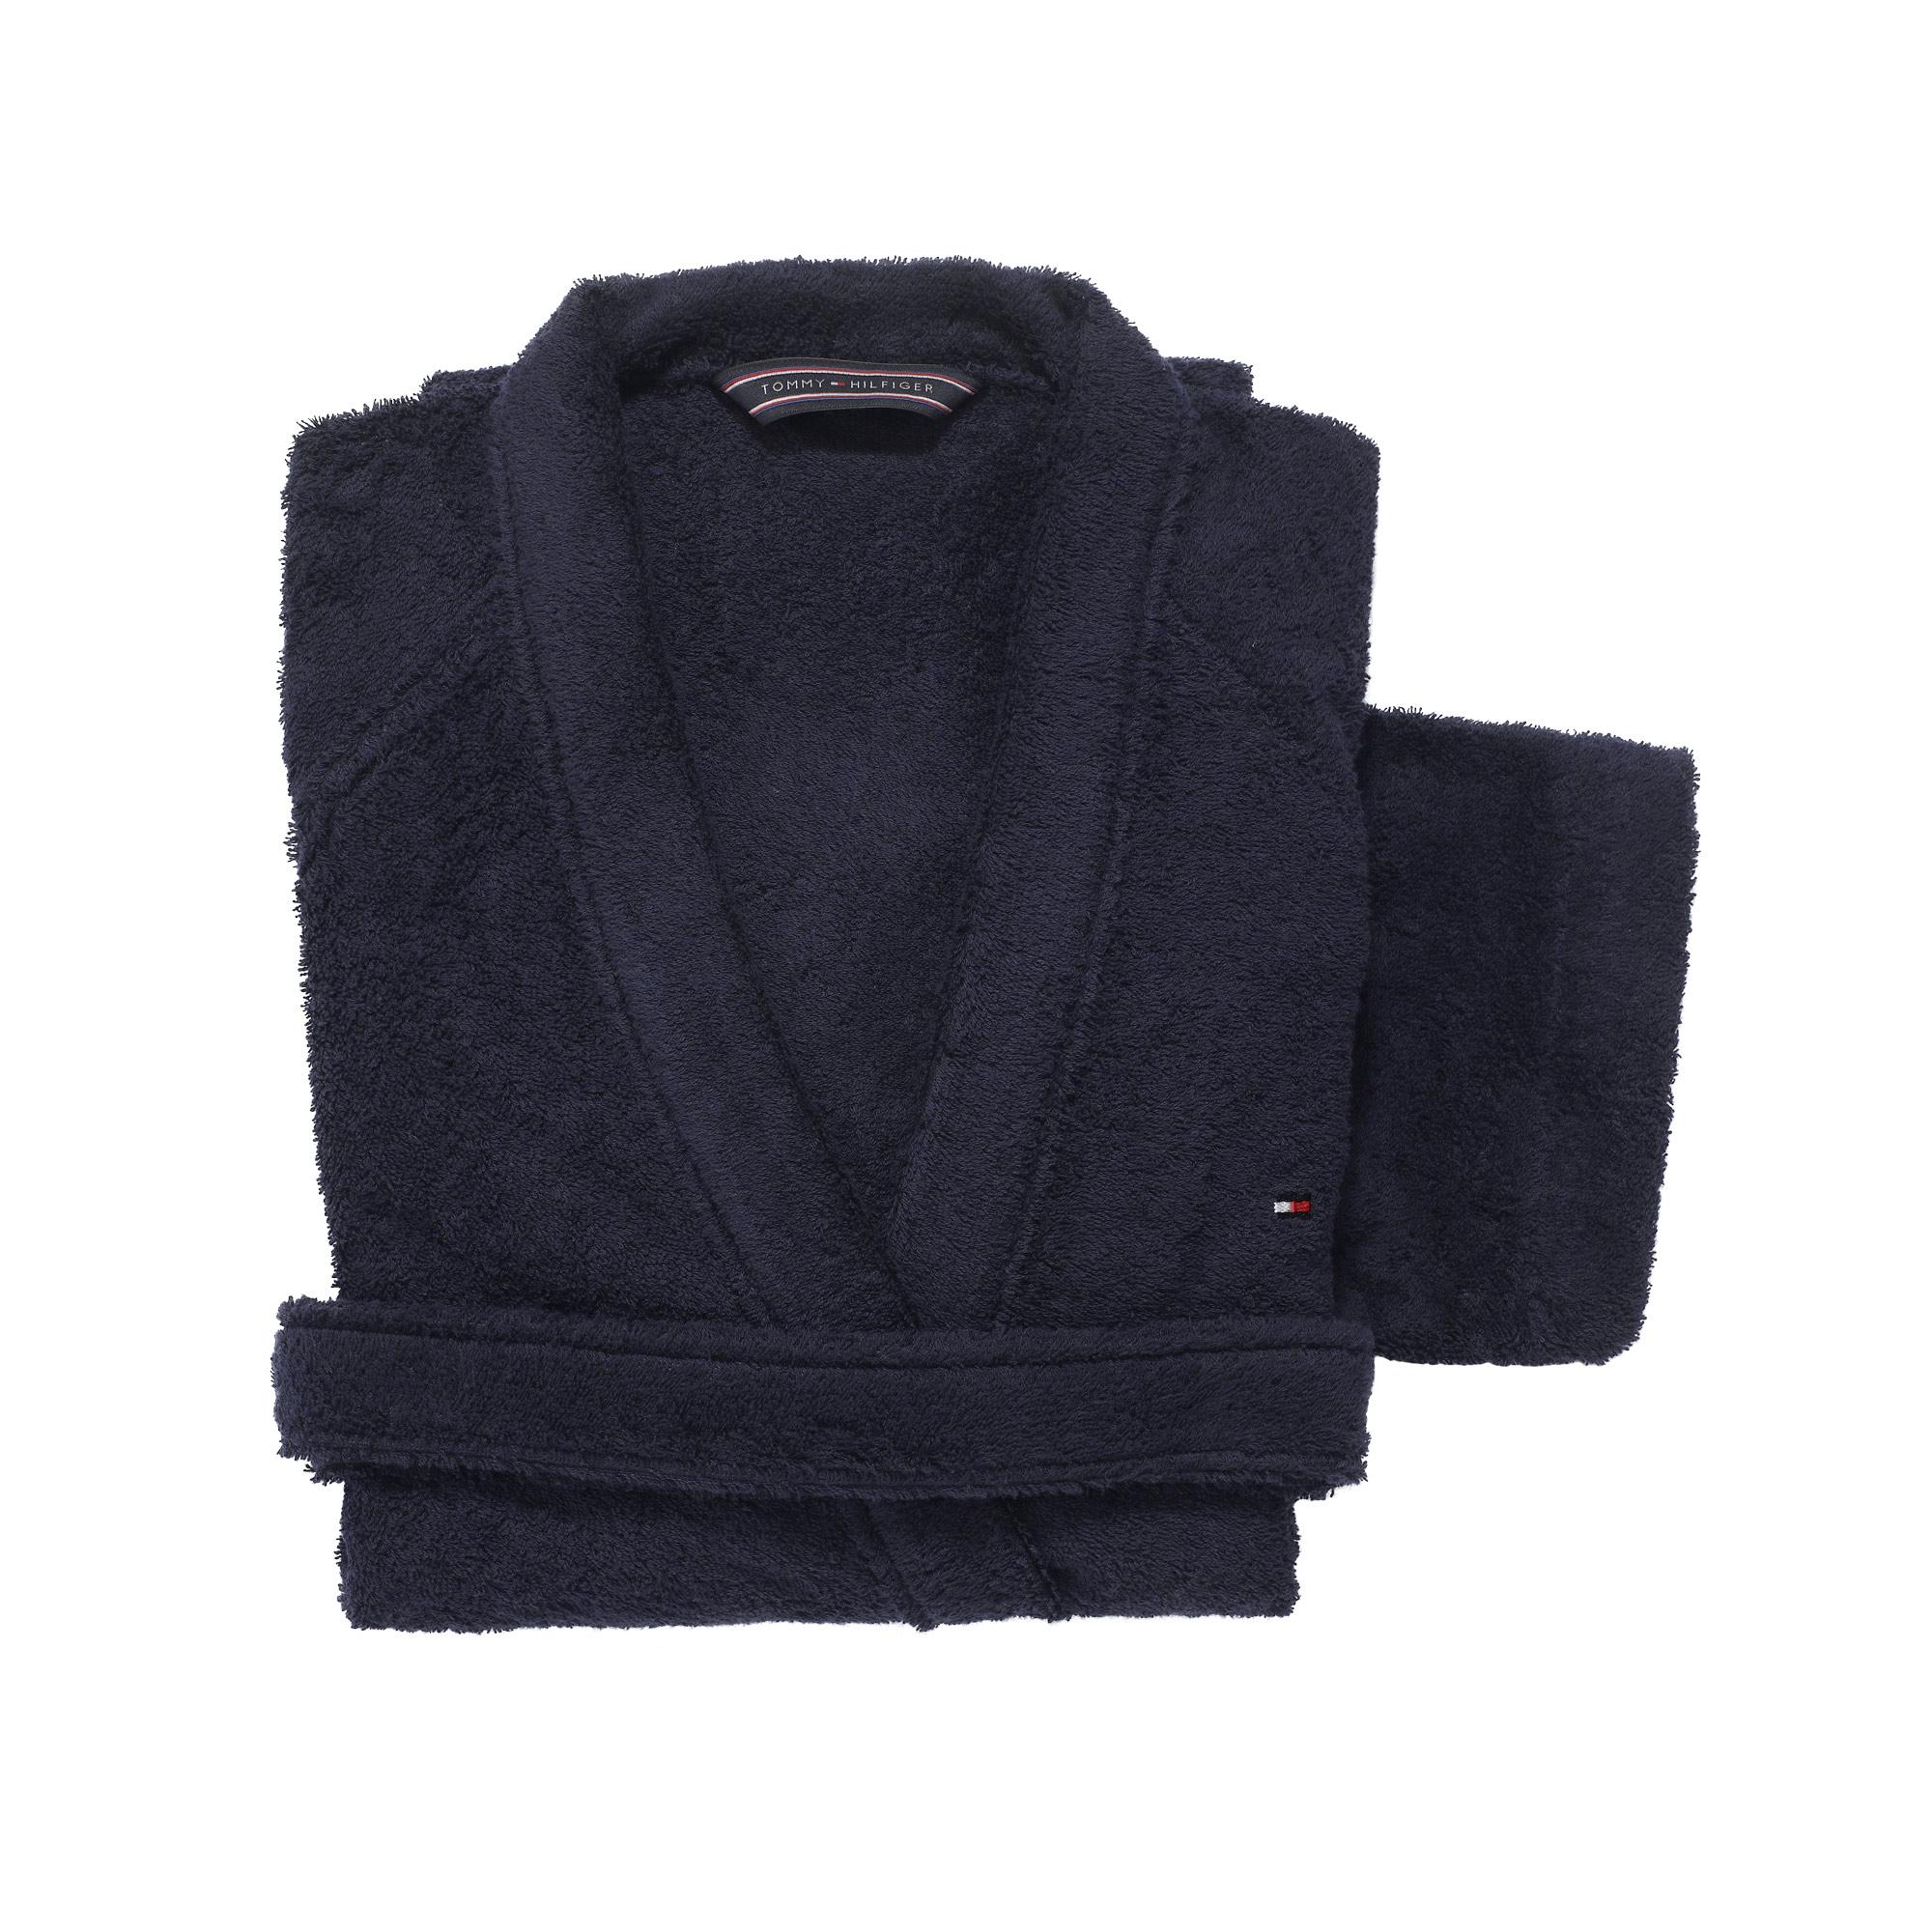 Halat de baie kimono Tommy Hilfiger Plain 2 Albastru Navy imagine